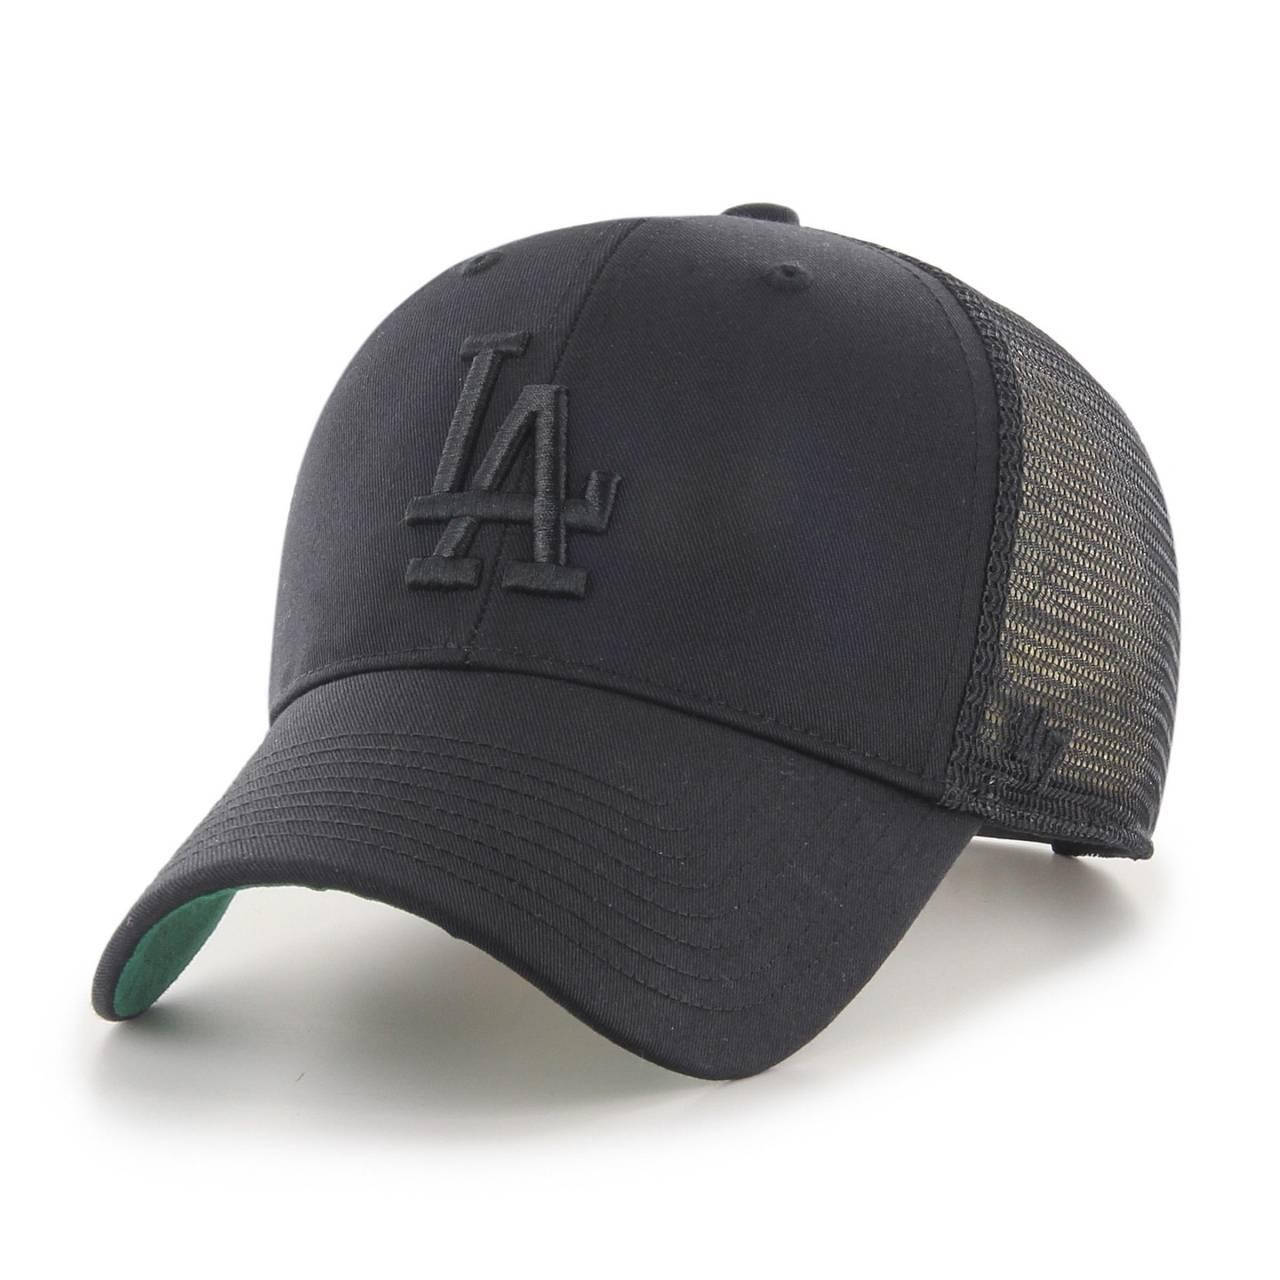 MLB LOS ANGELES DODGERS BRANSON '47 MVP CAP